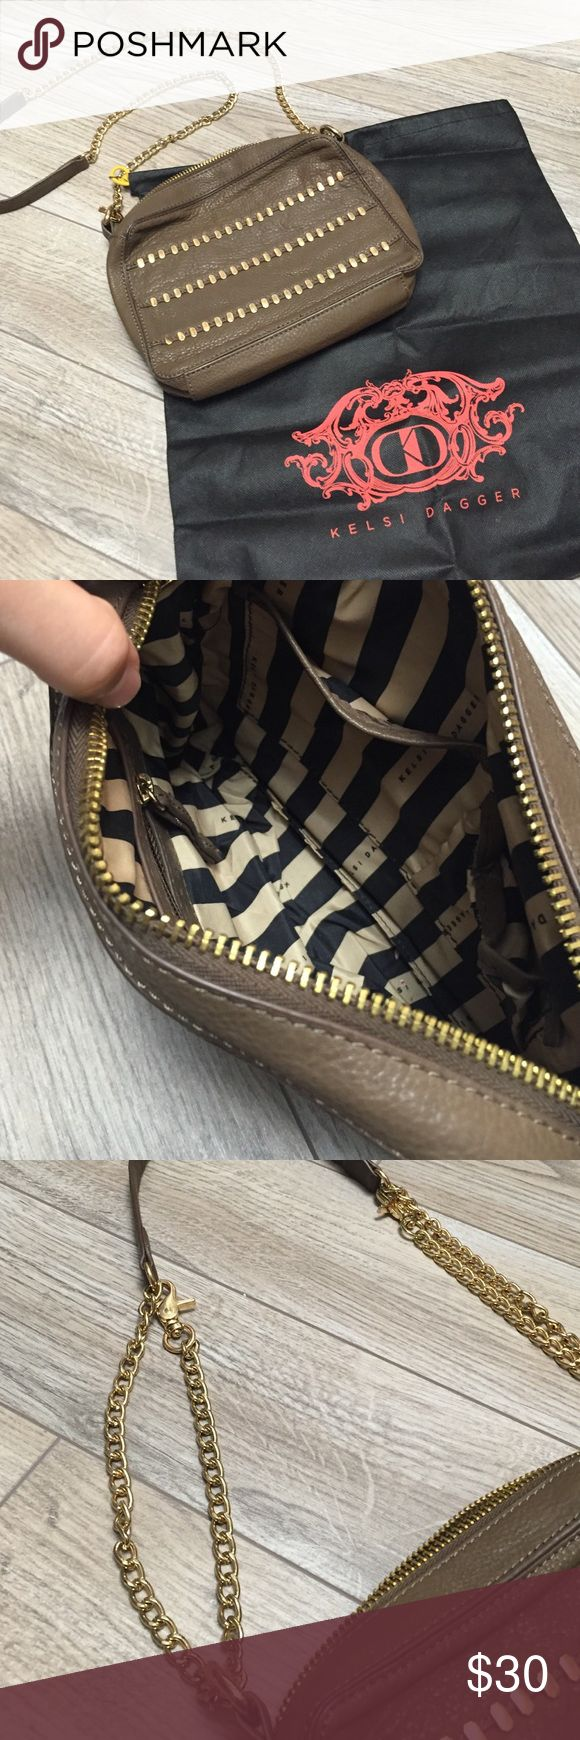 Spotted while shopping on Poshmark: Kelsi Dagger Crossbody! #poshmark #fashion #shopping #style #Kelsi Dagger #Handbags